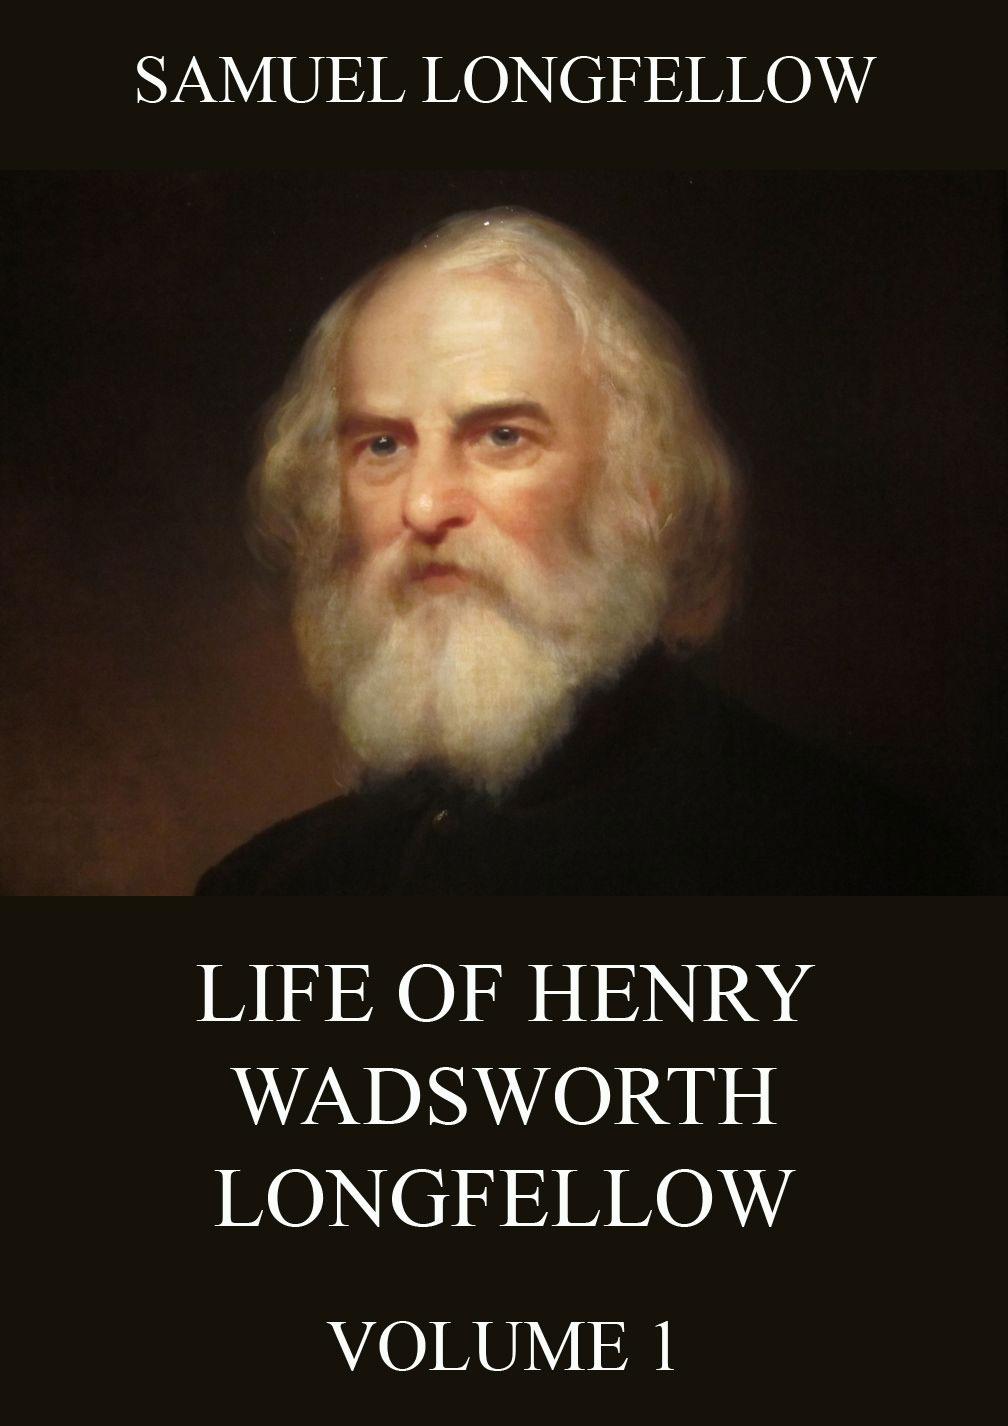 Samuel Longfellow Life Of Henry Wadsworth Longfellow, Volume 1 henry wadsworth longfellow evangeline